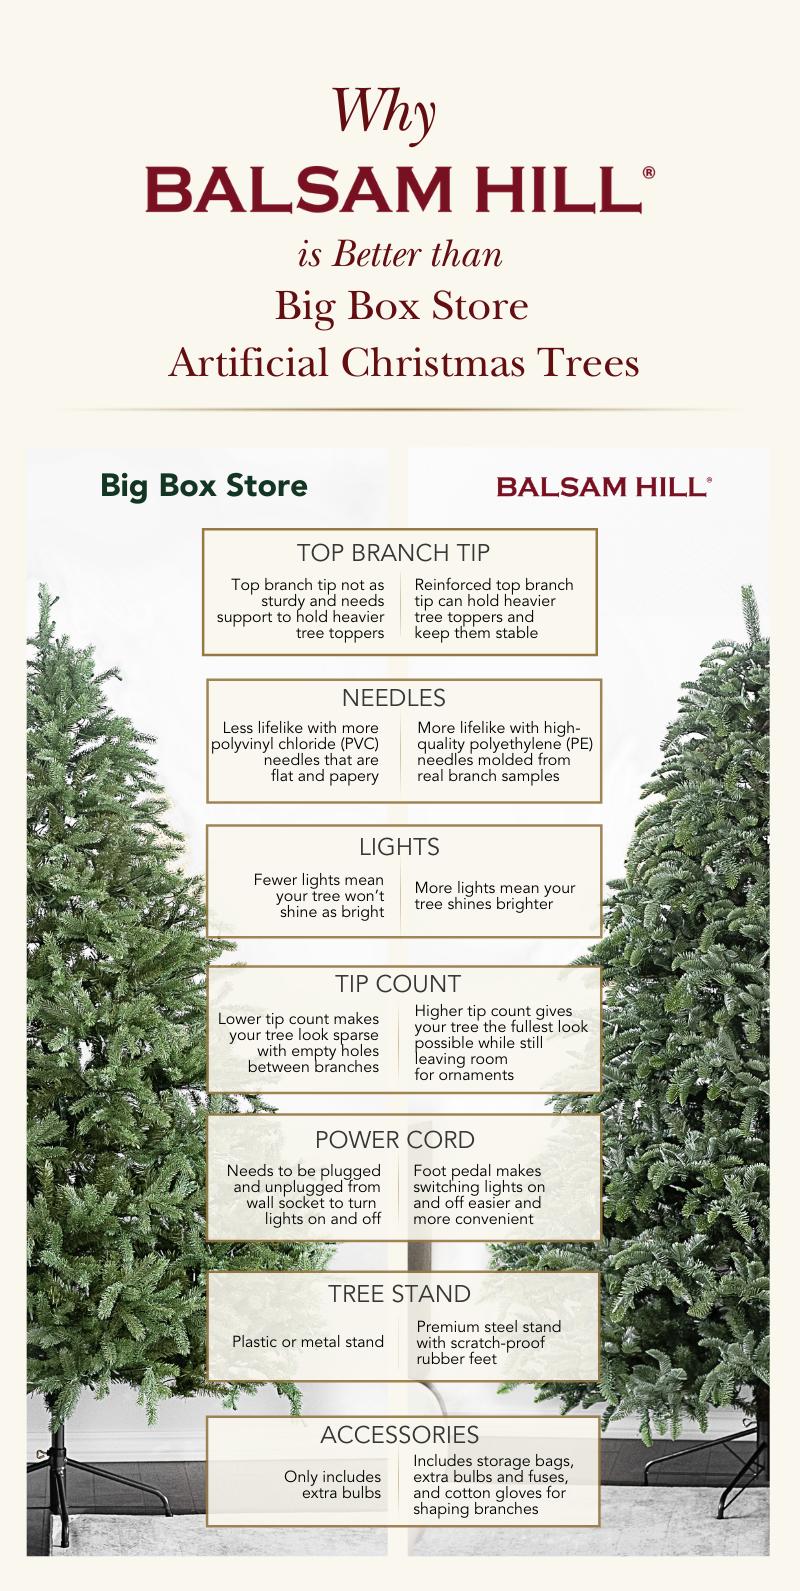 Balsam Hill vs Big Box Store Infographic